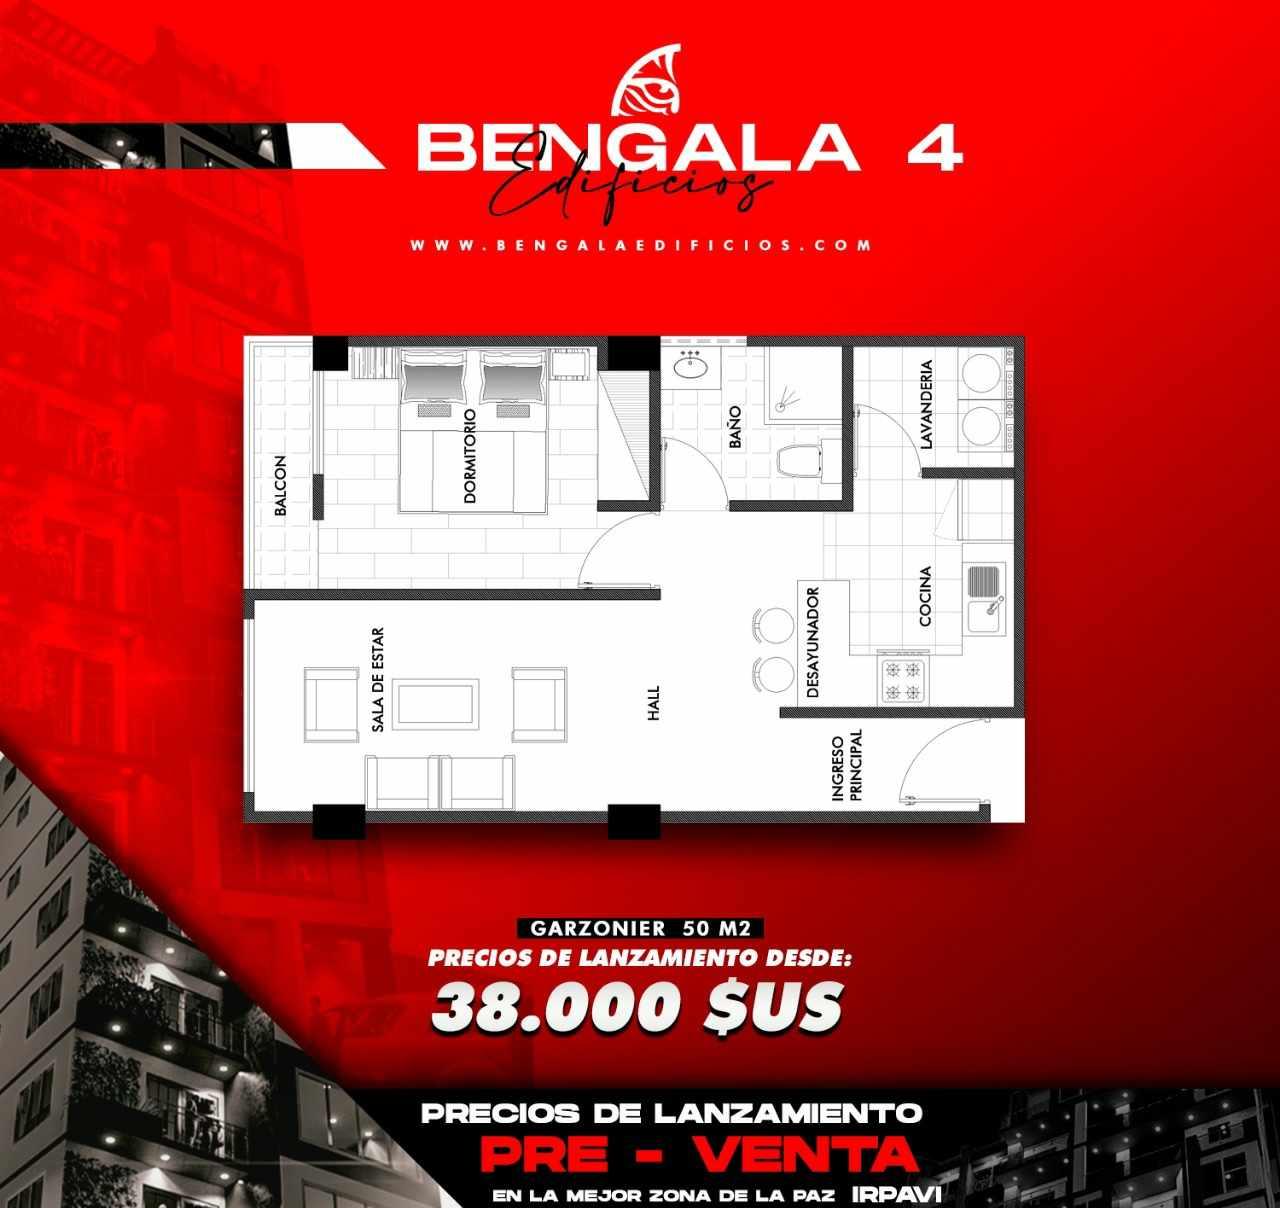 Bengala 4